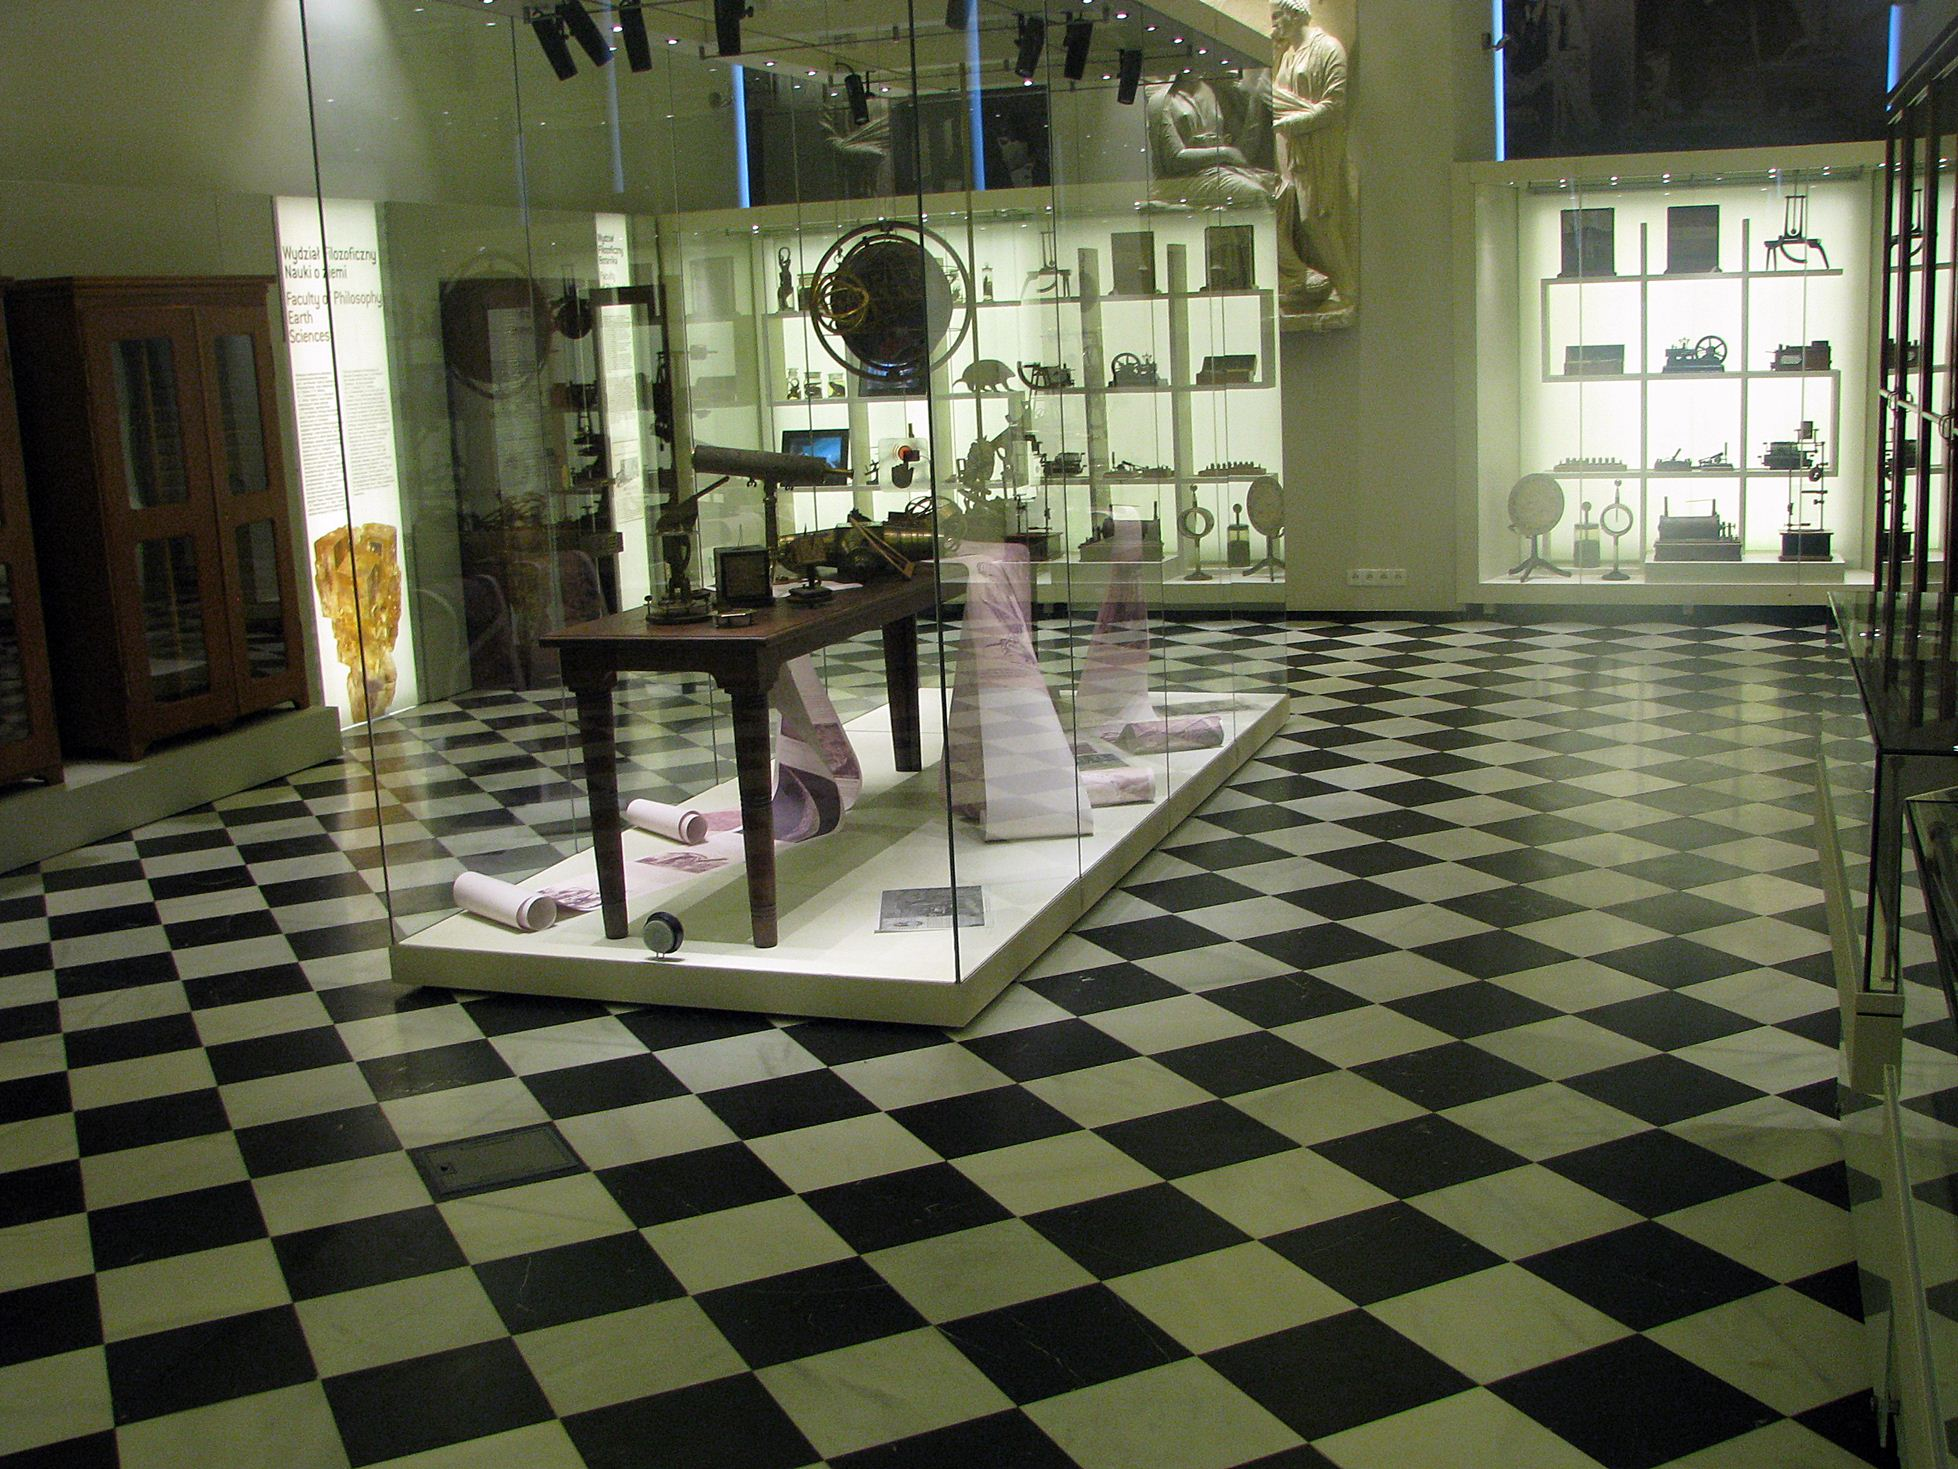 Blanco Macael and Nero Marquina Spanish flooring black and white marble floor tiles